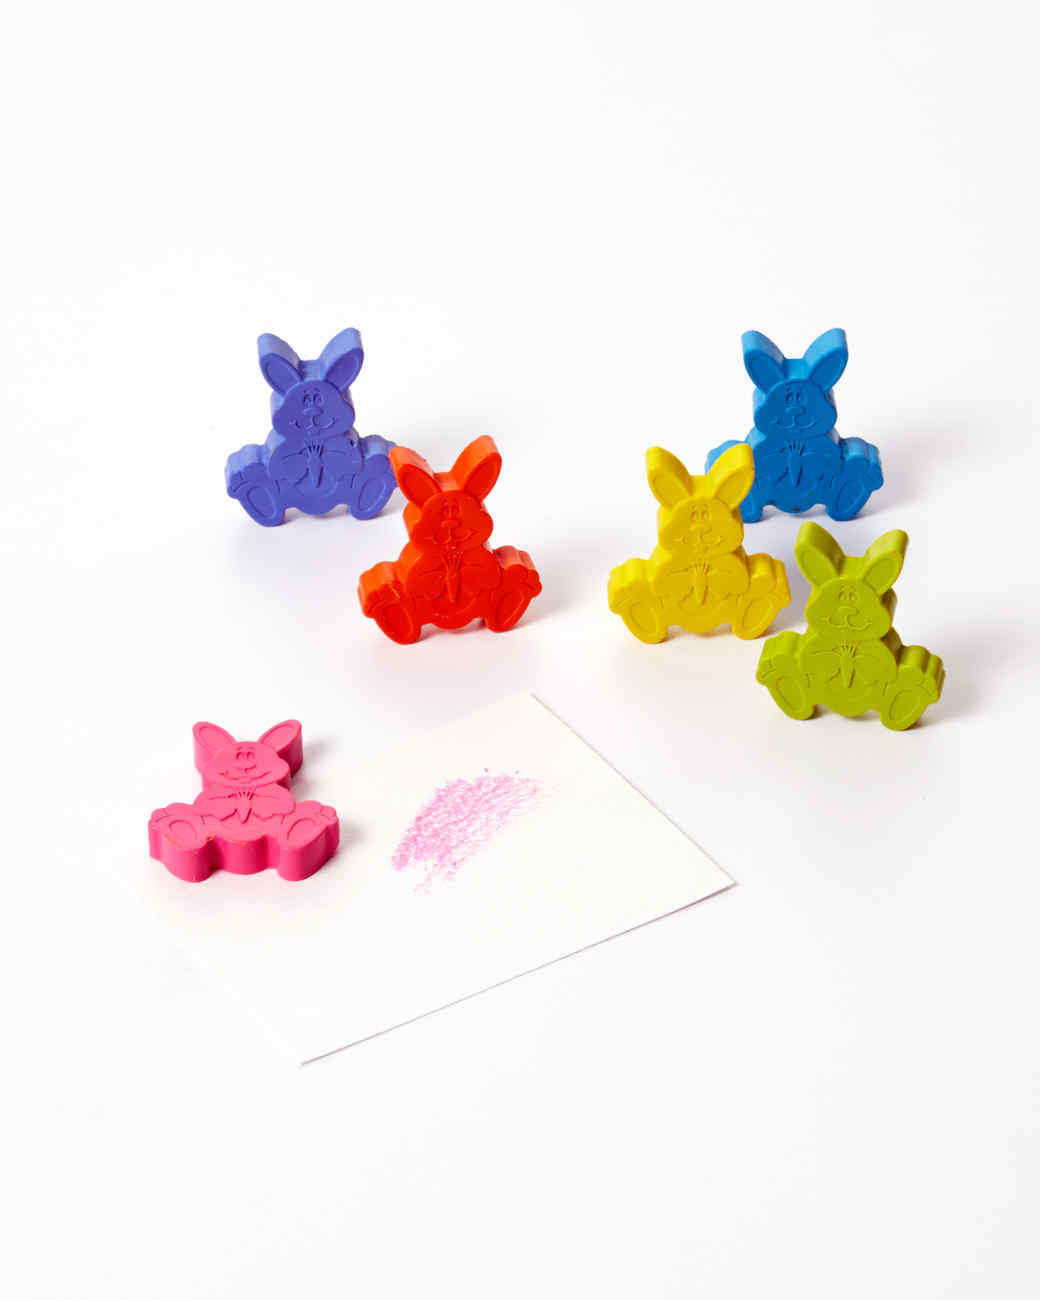 crafty-girl-bunny-crayons-2858-d112789-0116.jpg